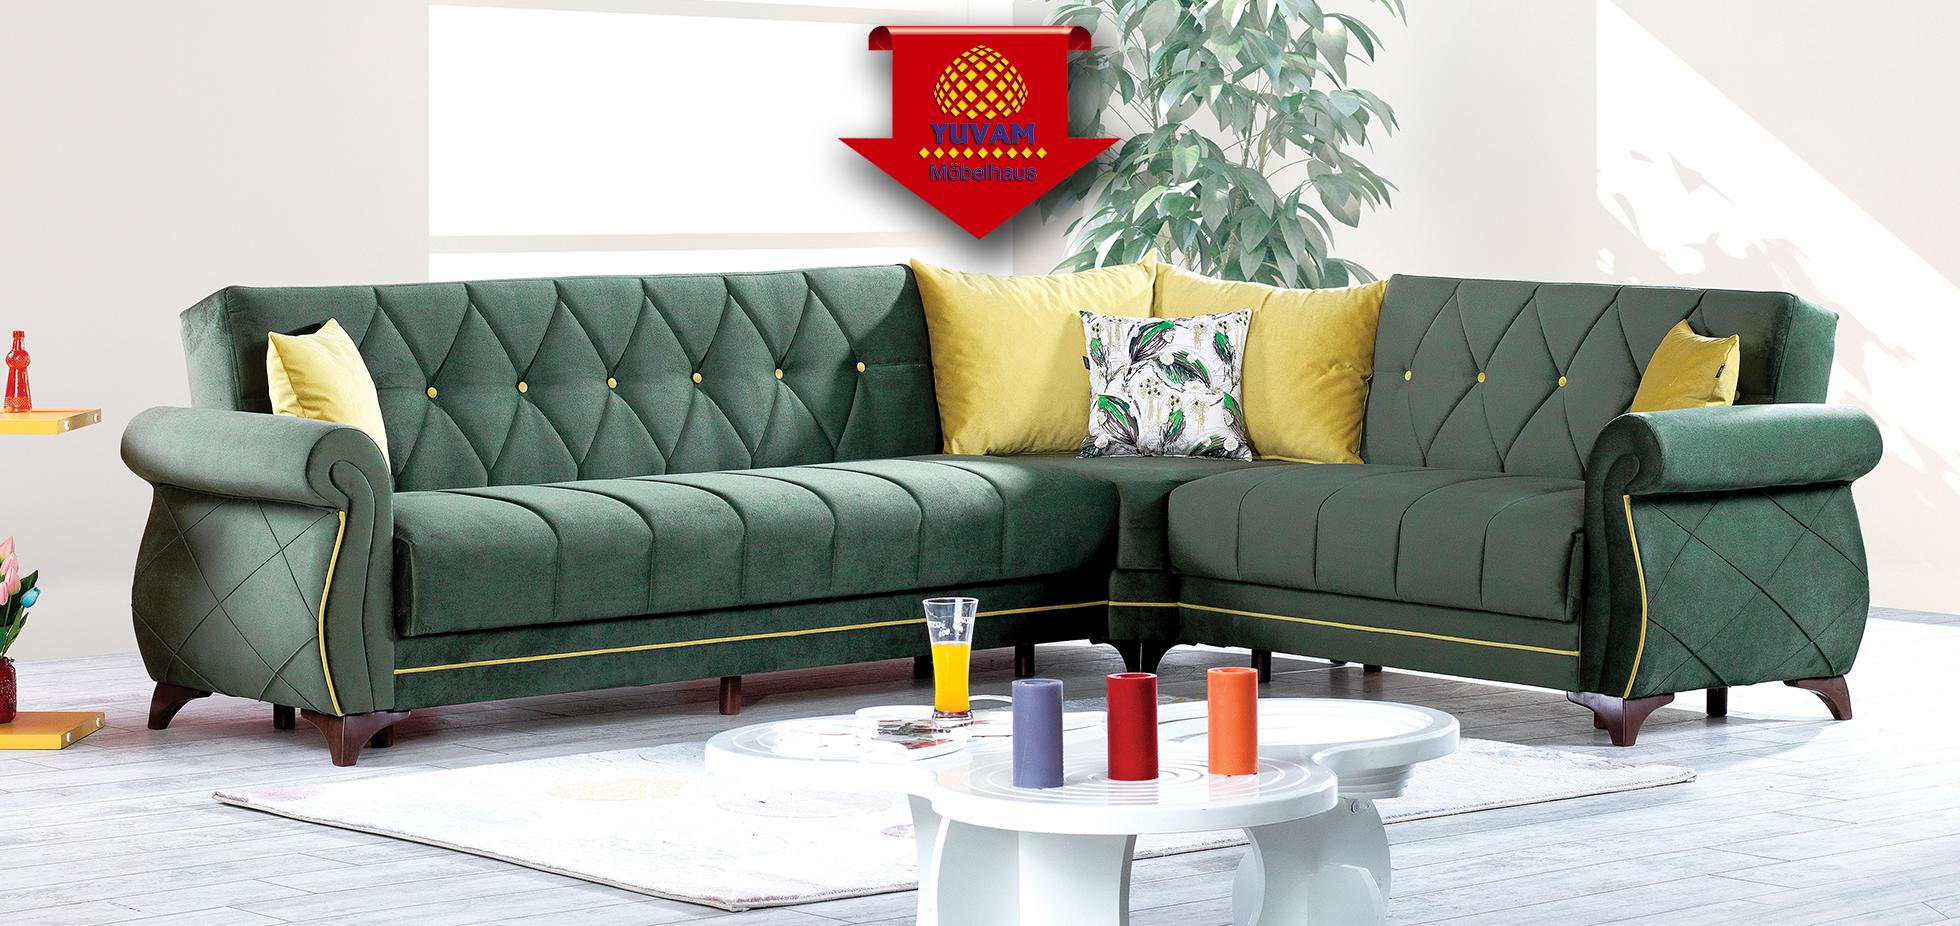 bade sitzecke 3 v 2 yuvam m belhaus in wuppertal cilek. Black Bedroom Furniture Sets. Home Design Ideas